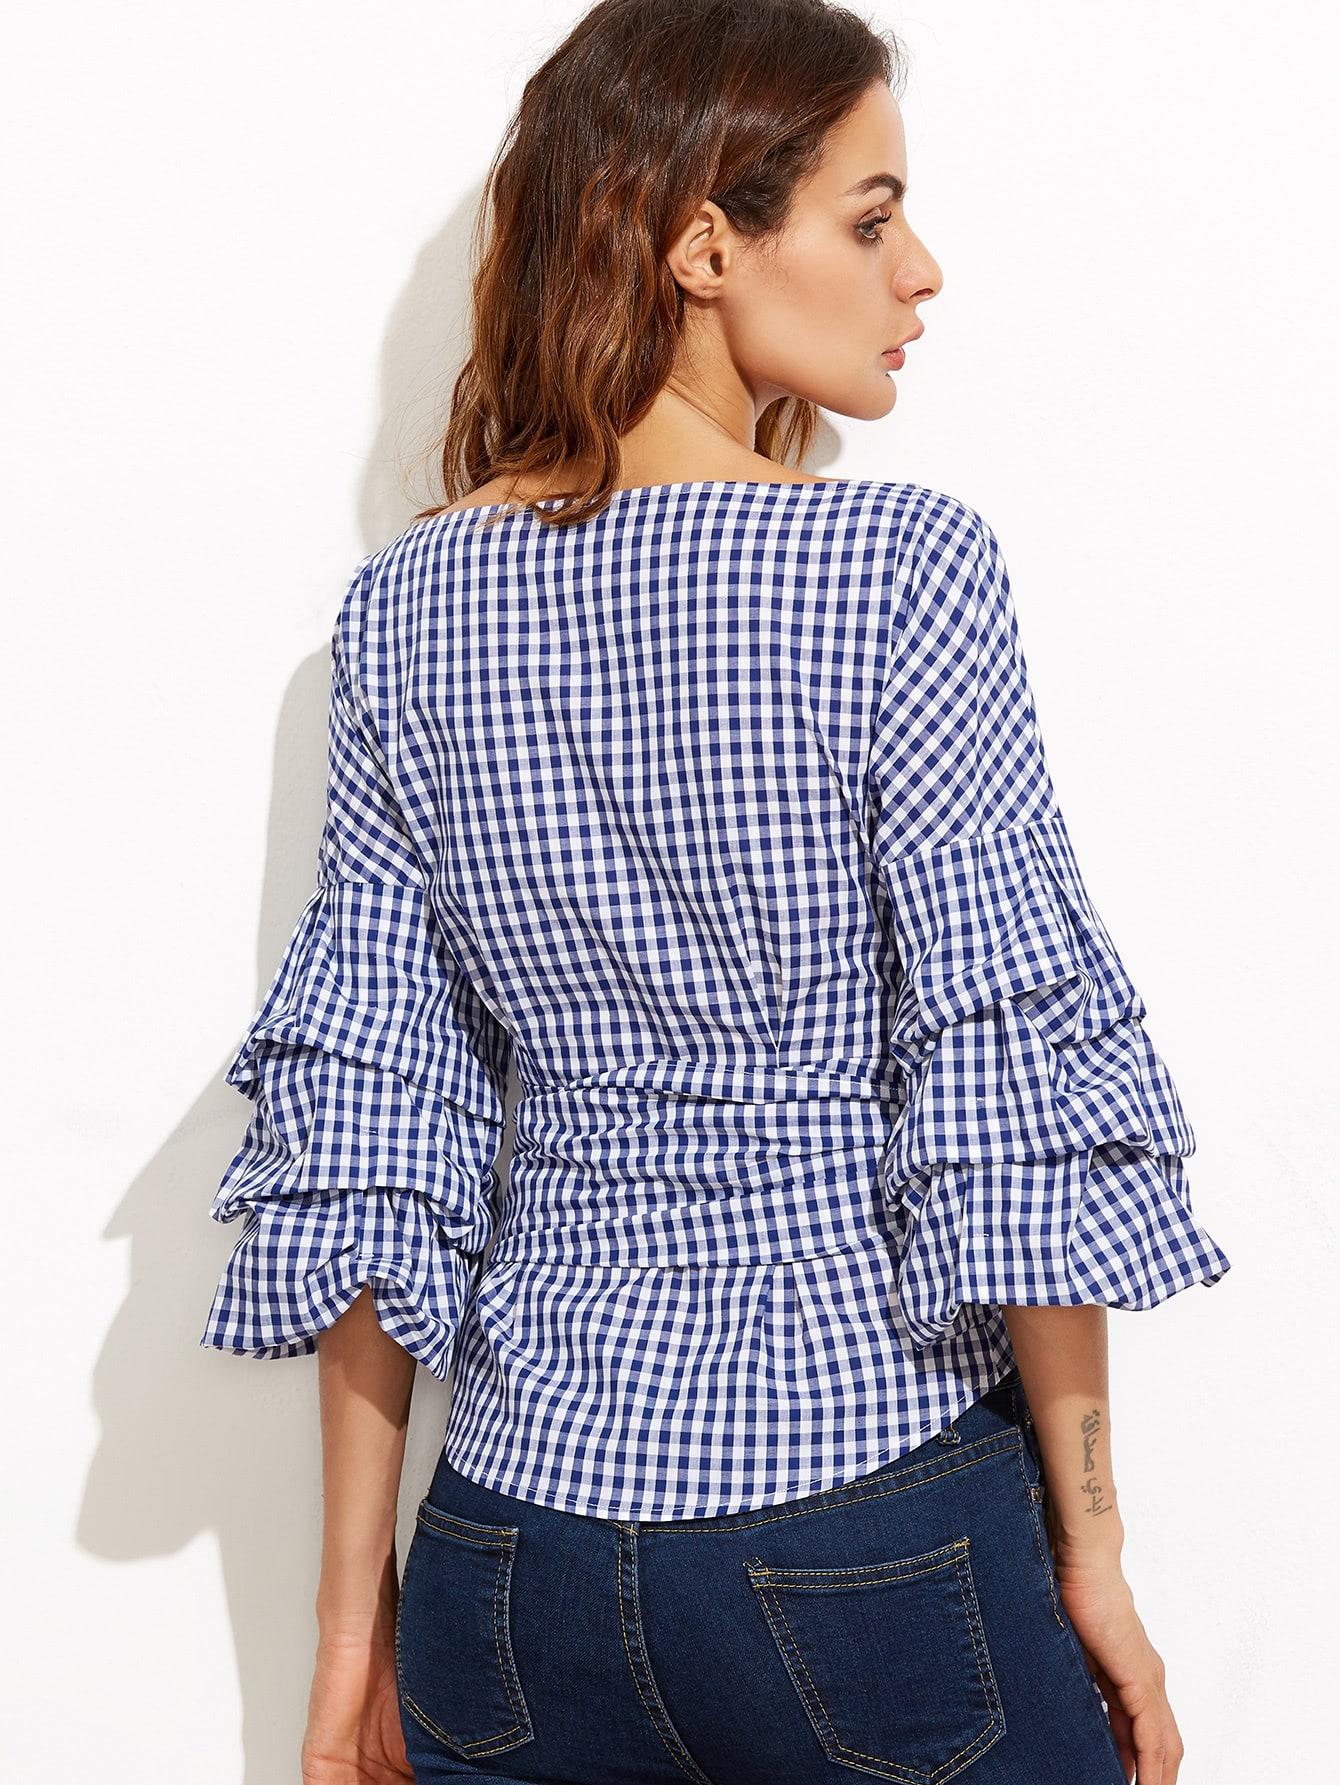 blouse160923702_3